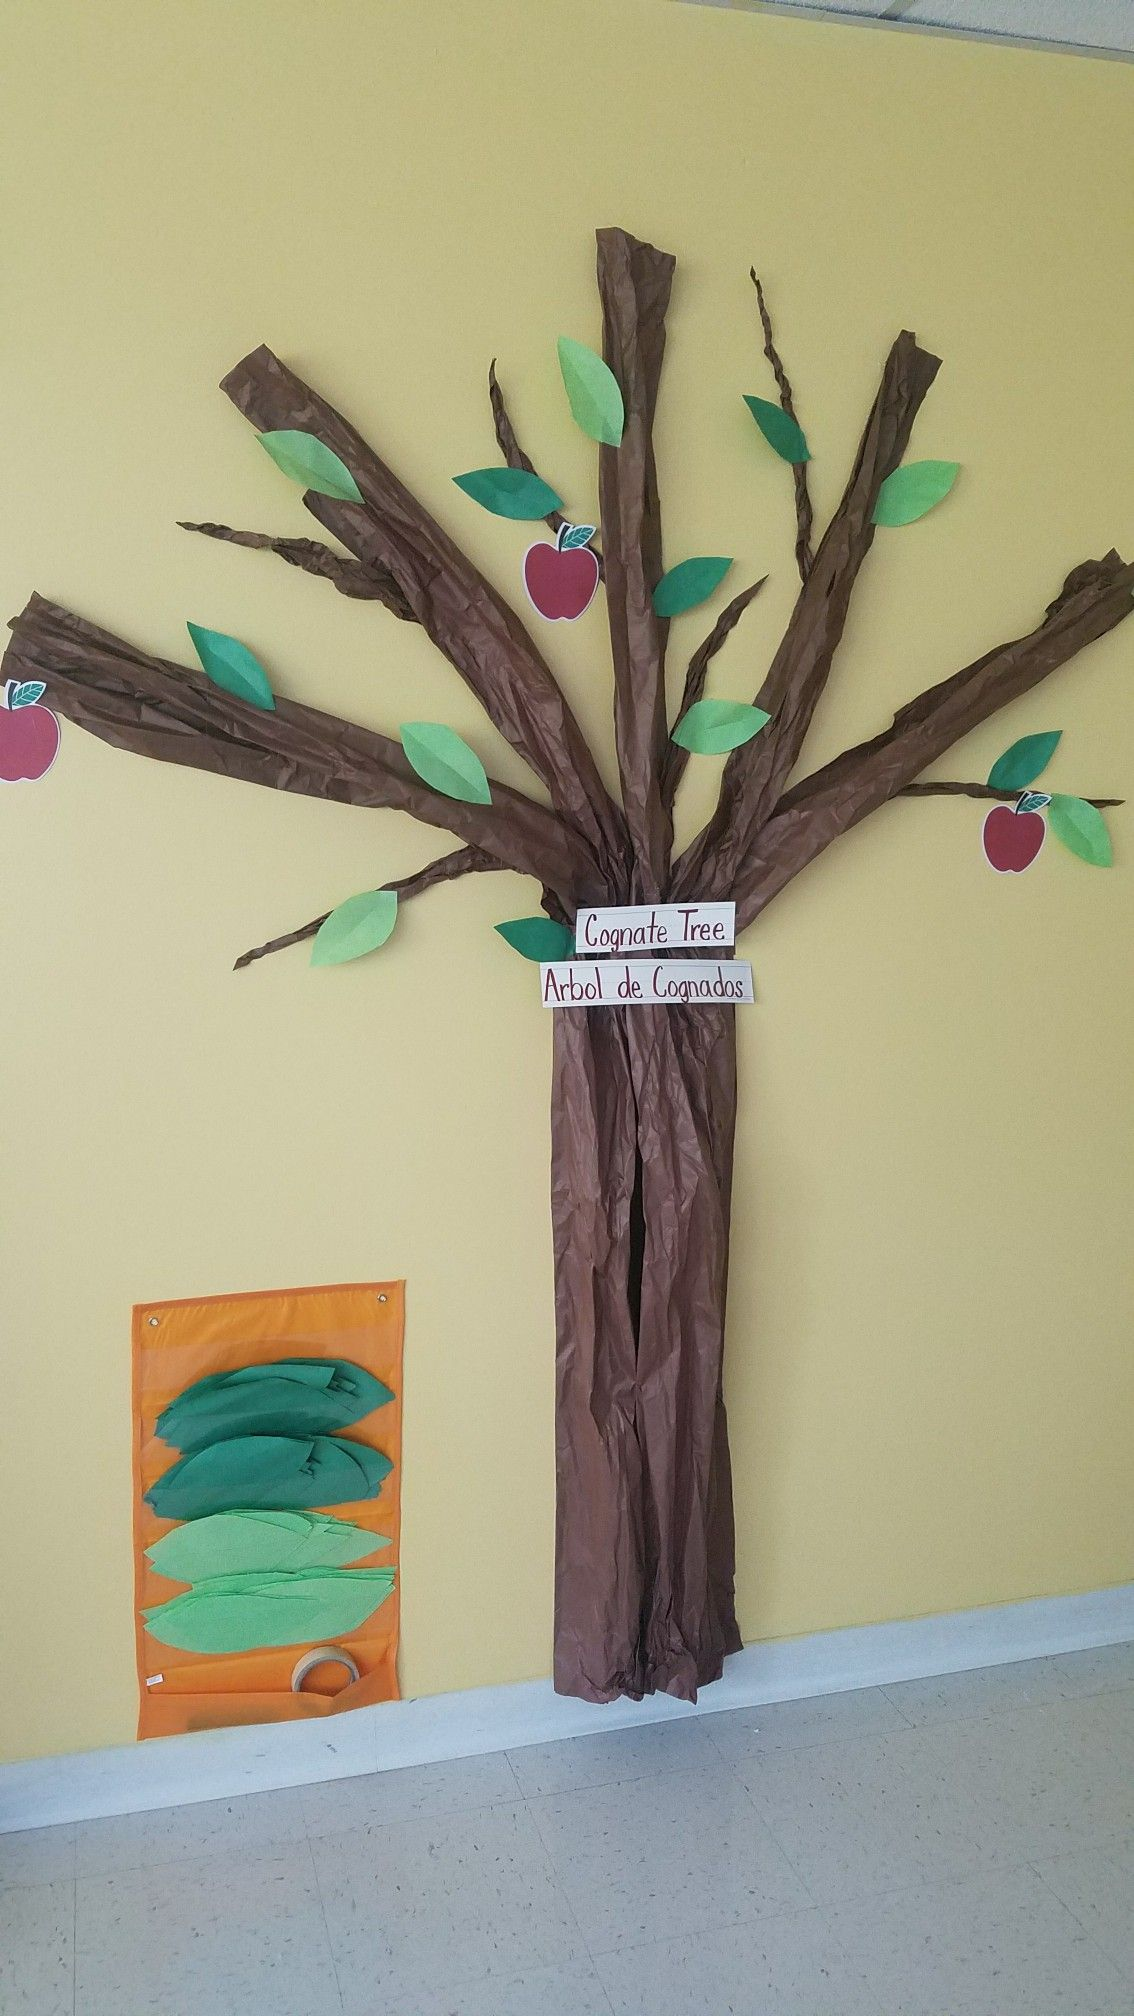 Cognate Tree Adding Spanish English Vocabulary Words On